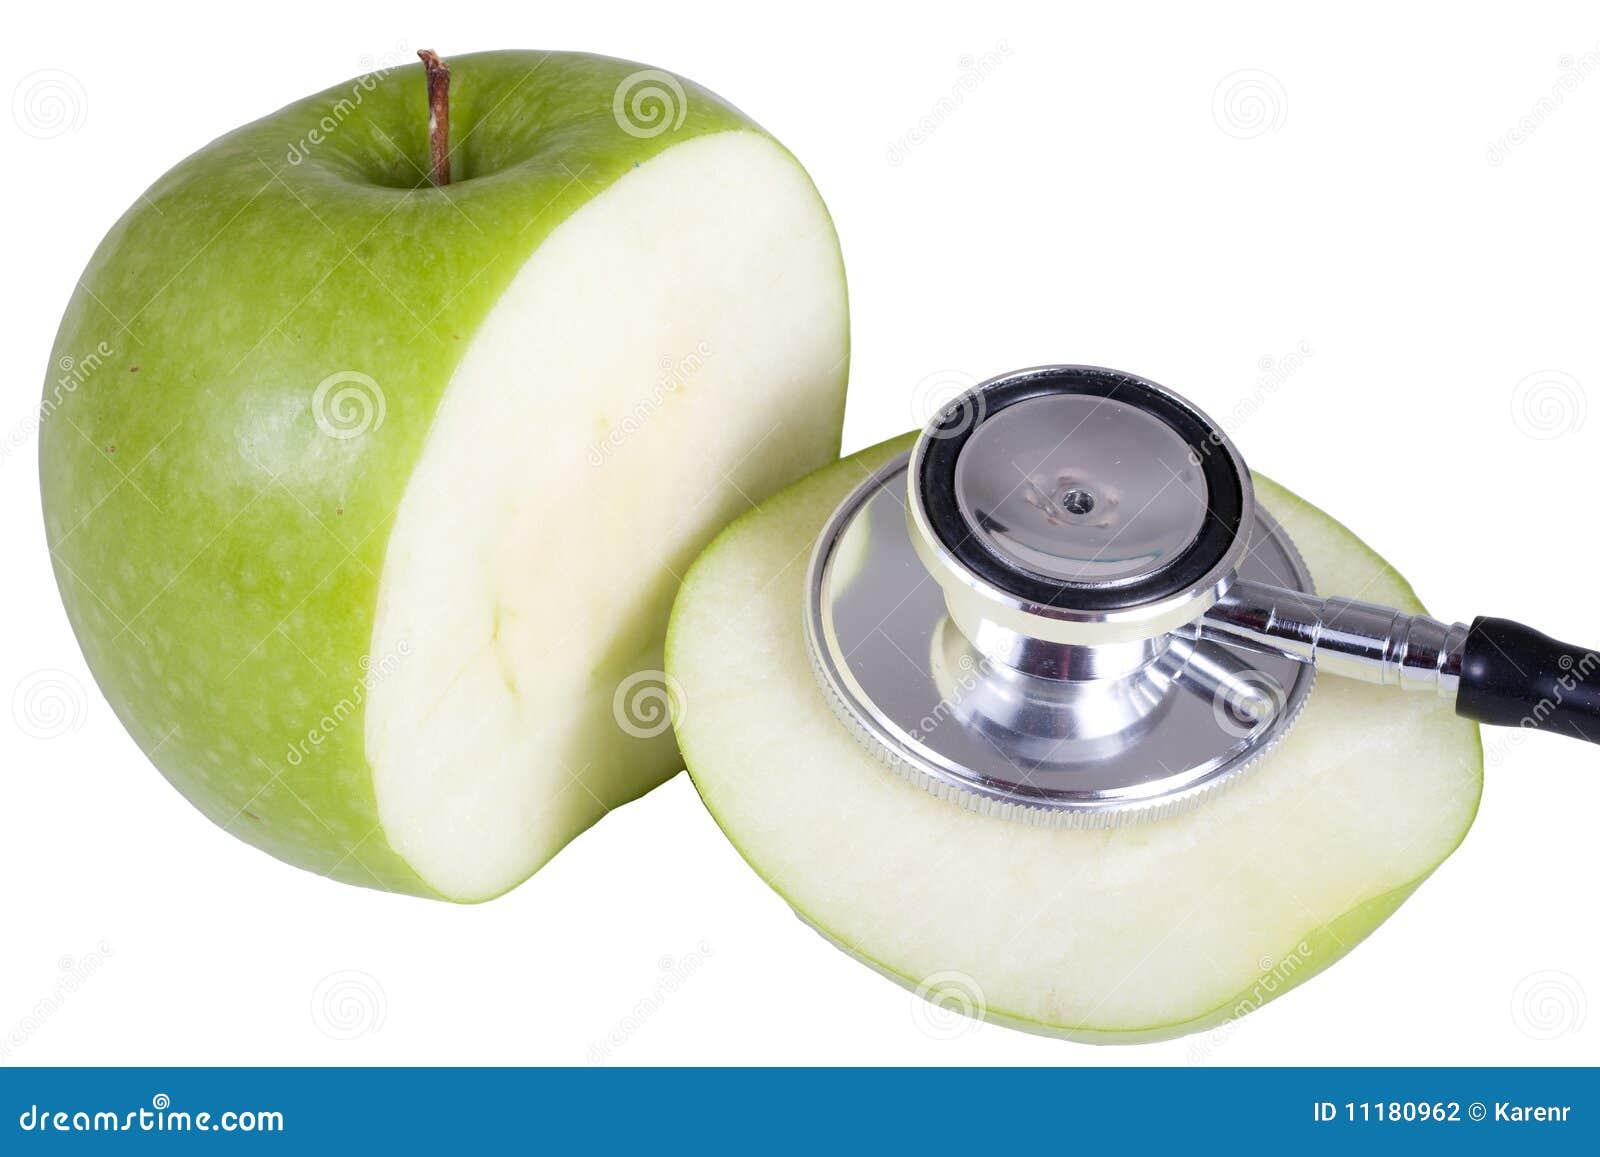 Eating heart healthy includes zero